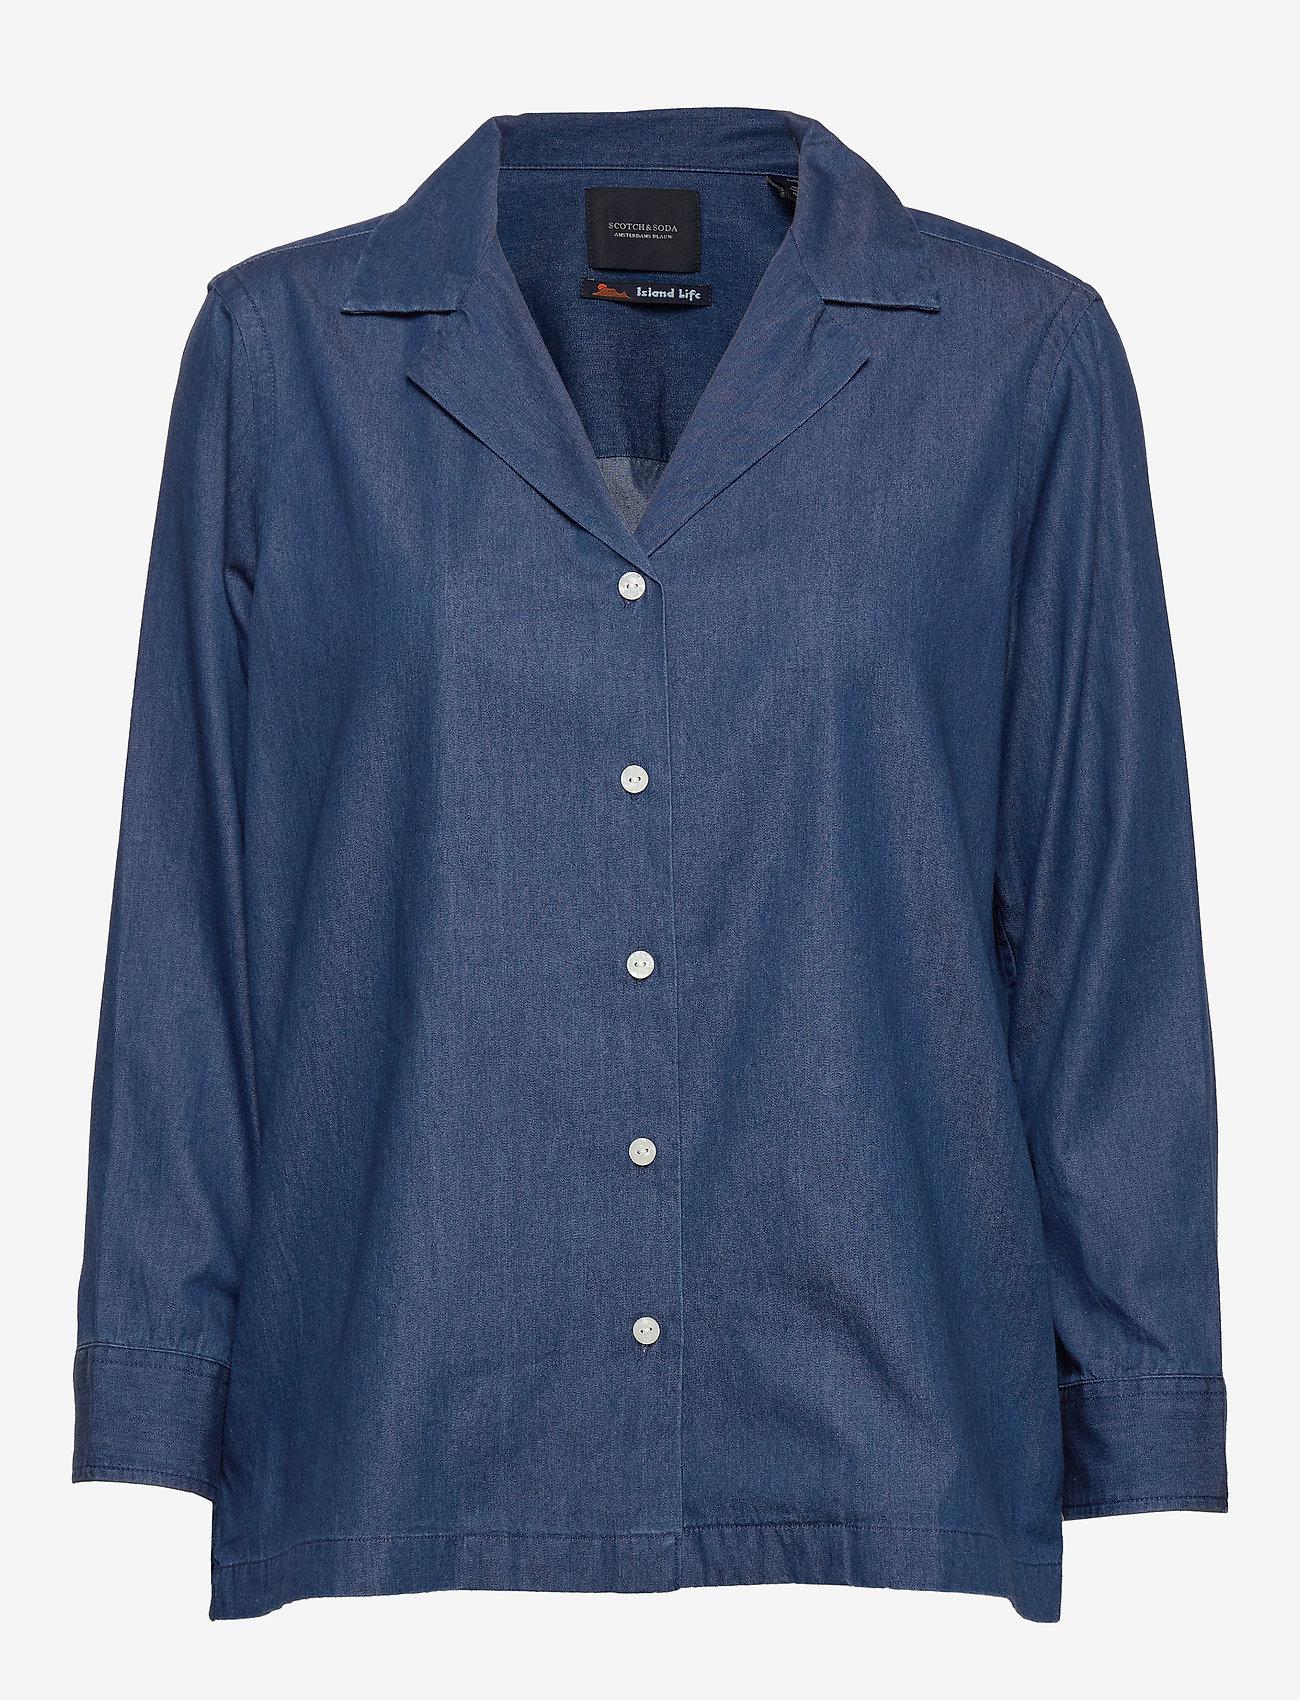 Scotch & Soda - Ams Blauw chic denim shirt with island collar - chemises en jeans - indigo - 0